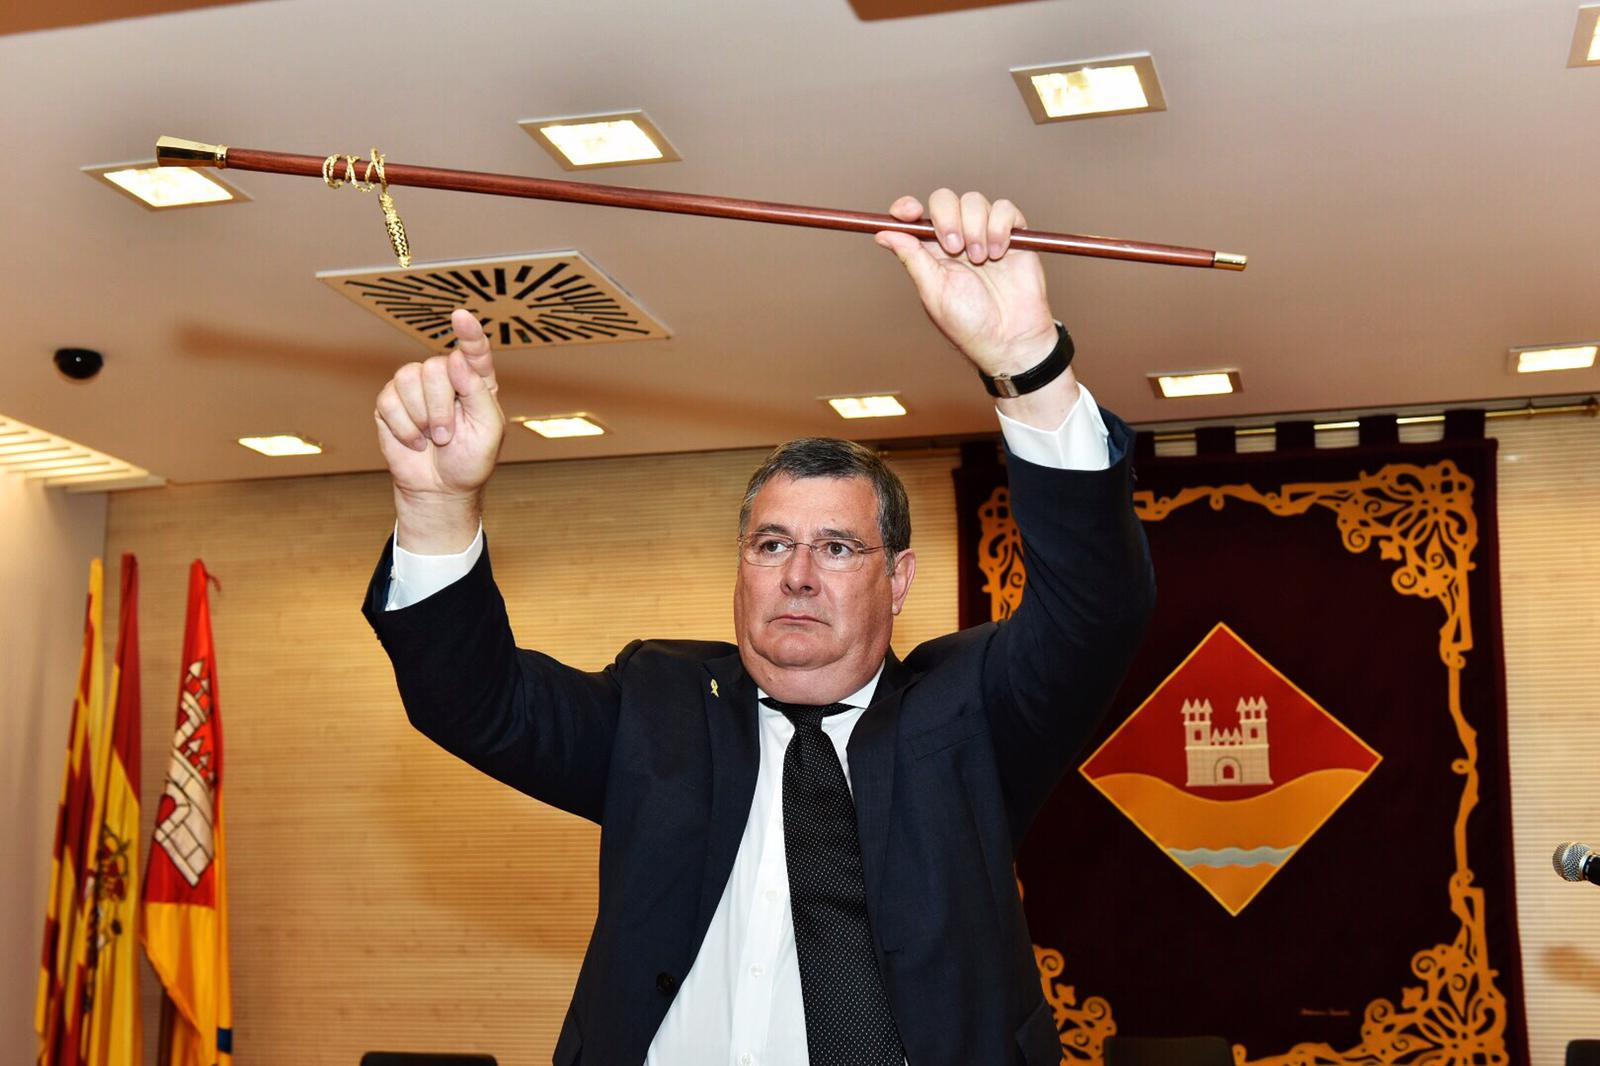 Josep Puig, president de l'EMD de Valldoreix. FOTO: Miguel López Mallach